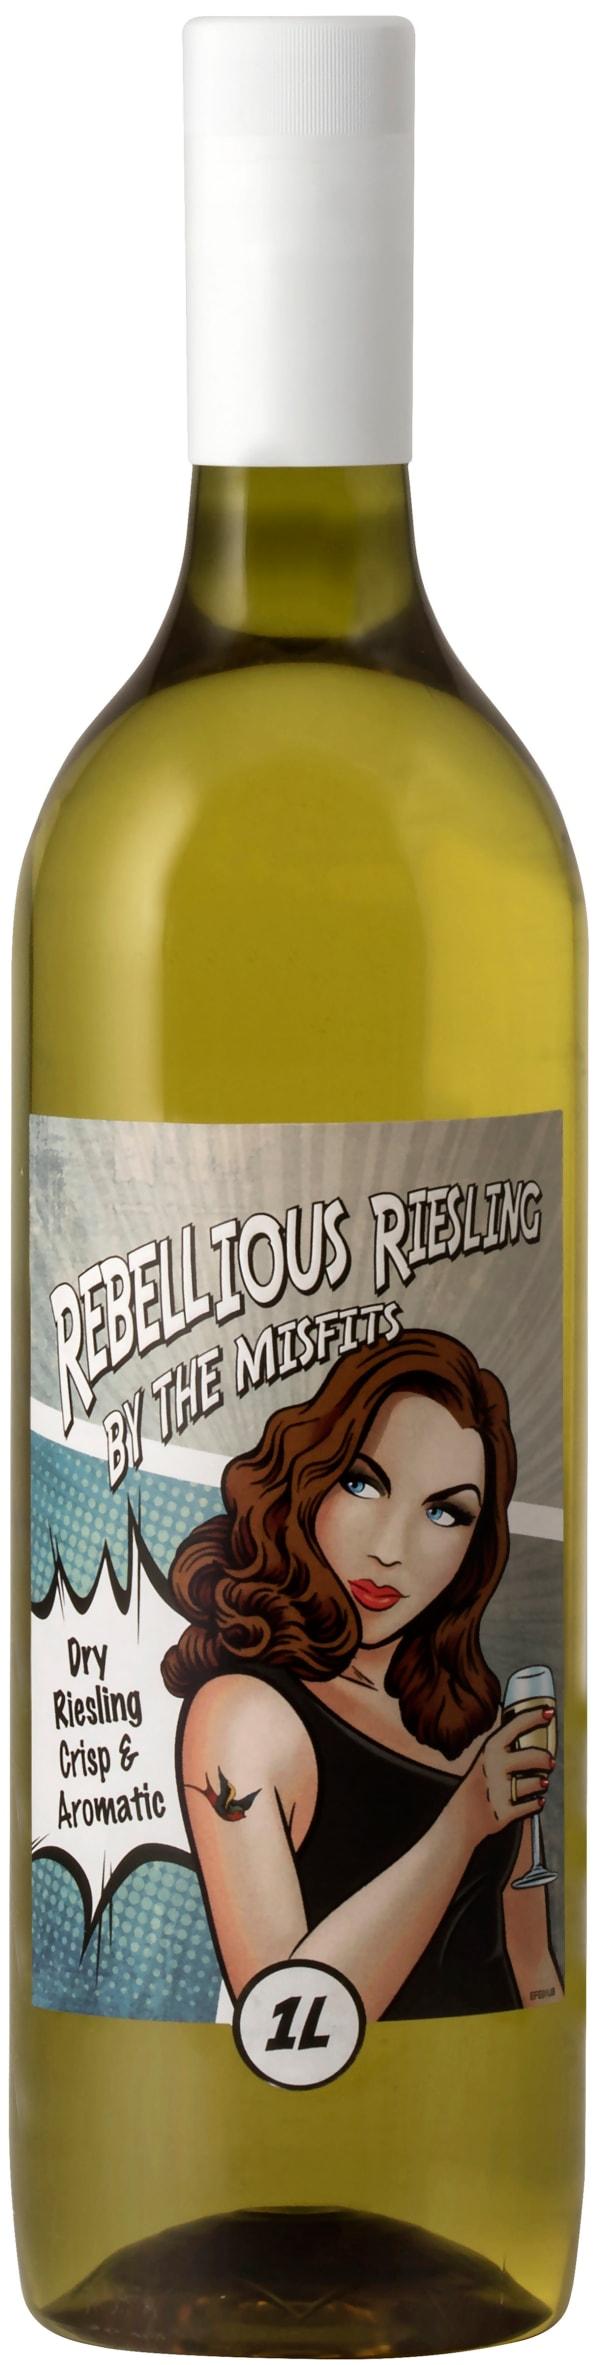 Rebellious Riesling  2020 plastic bottle